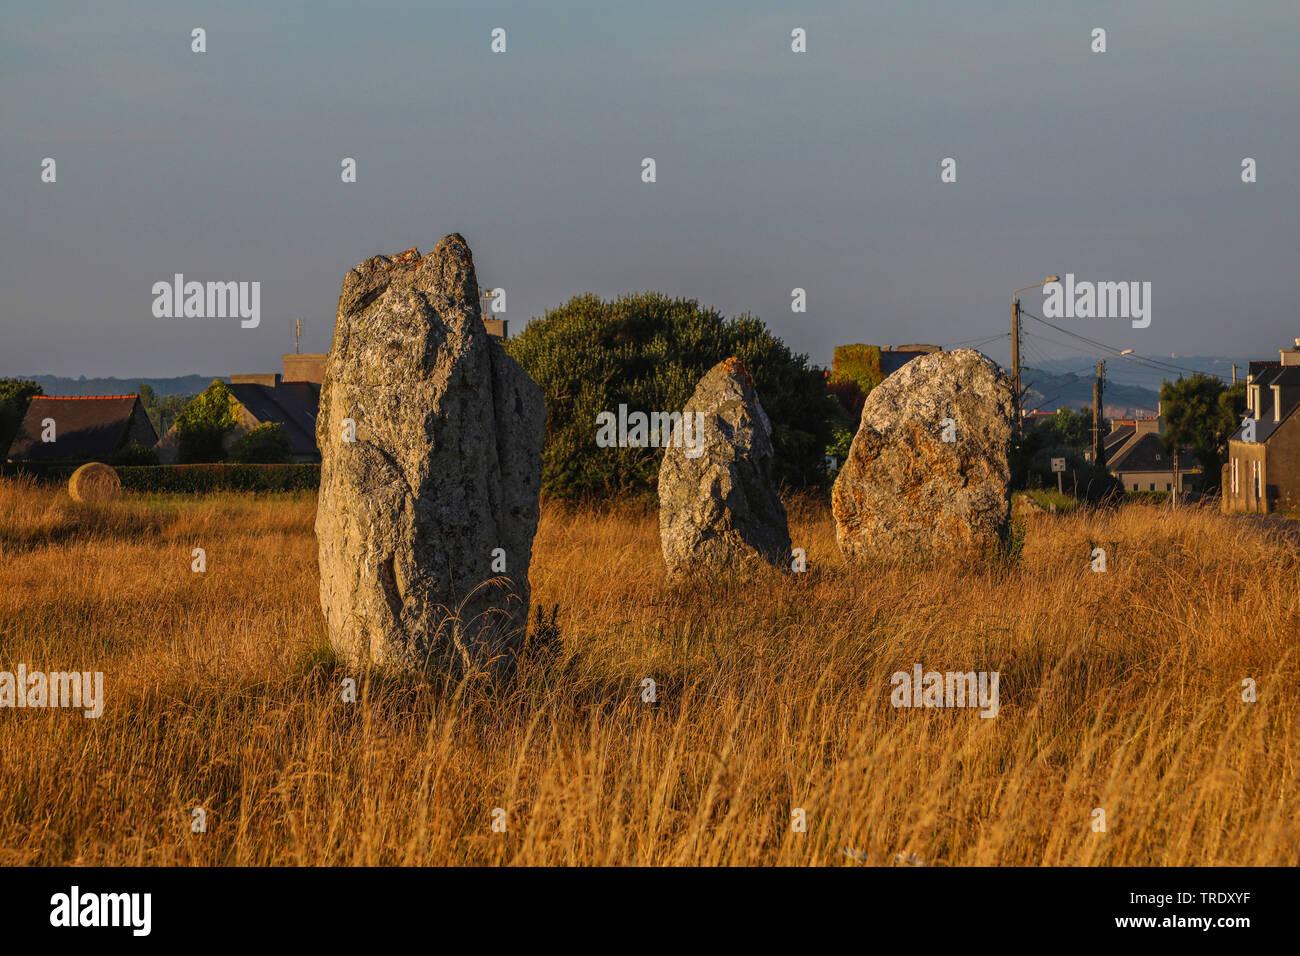 alignment of Lagatjar near Camaret-sur-Mer, France, Brittany - Stock Image